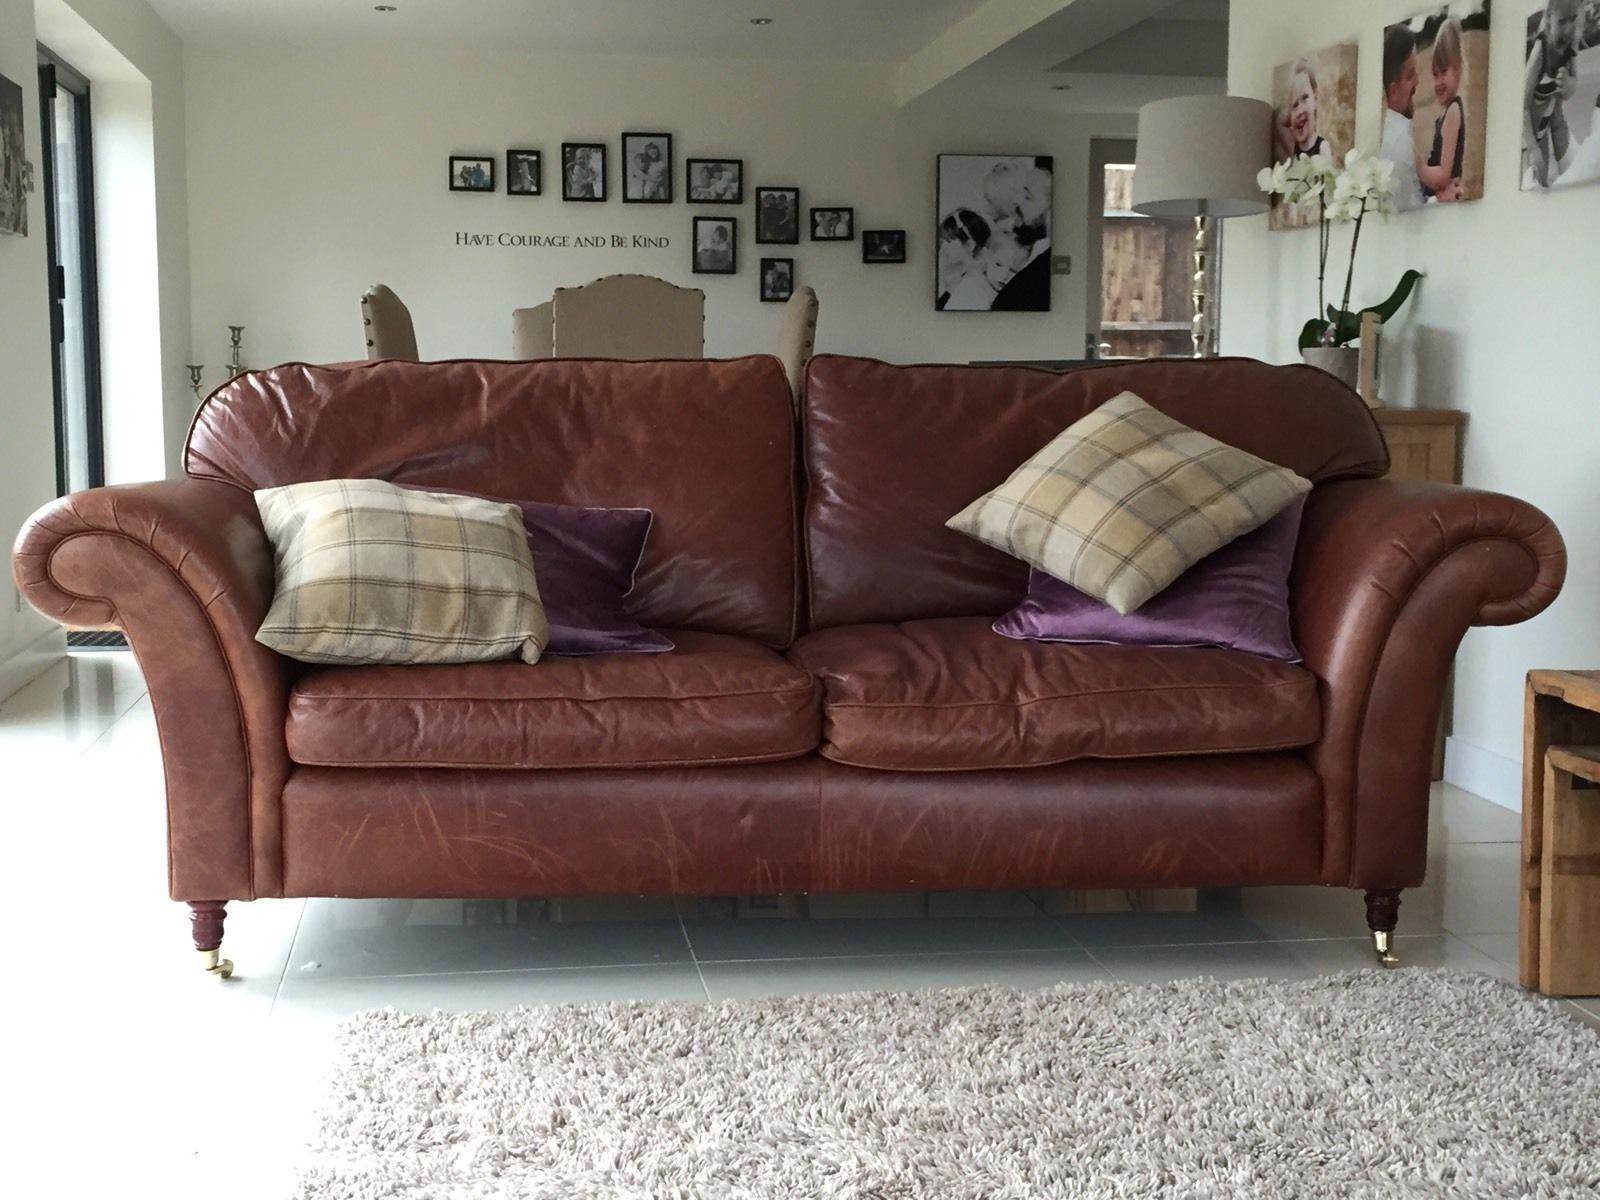 Laura Ashley Sofas Mortimer Large Sofa Brown Vintage Leather 4